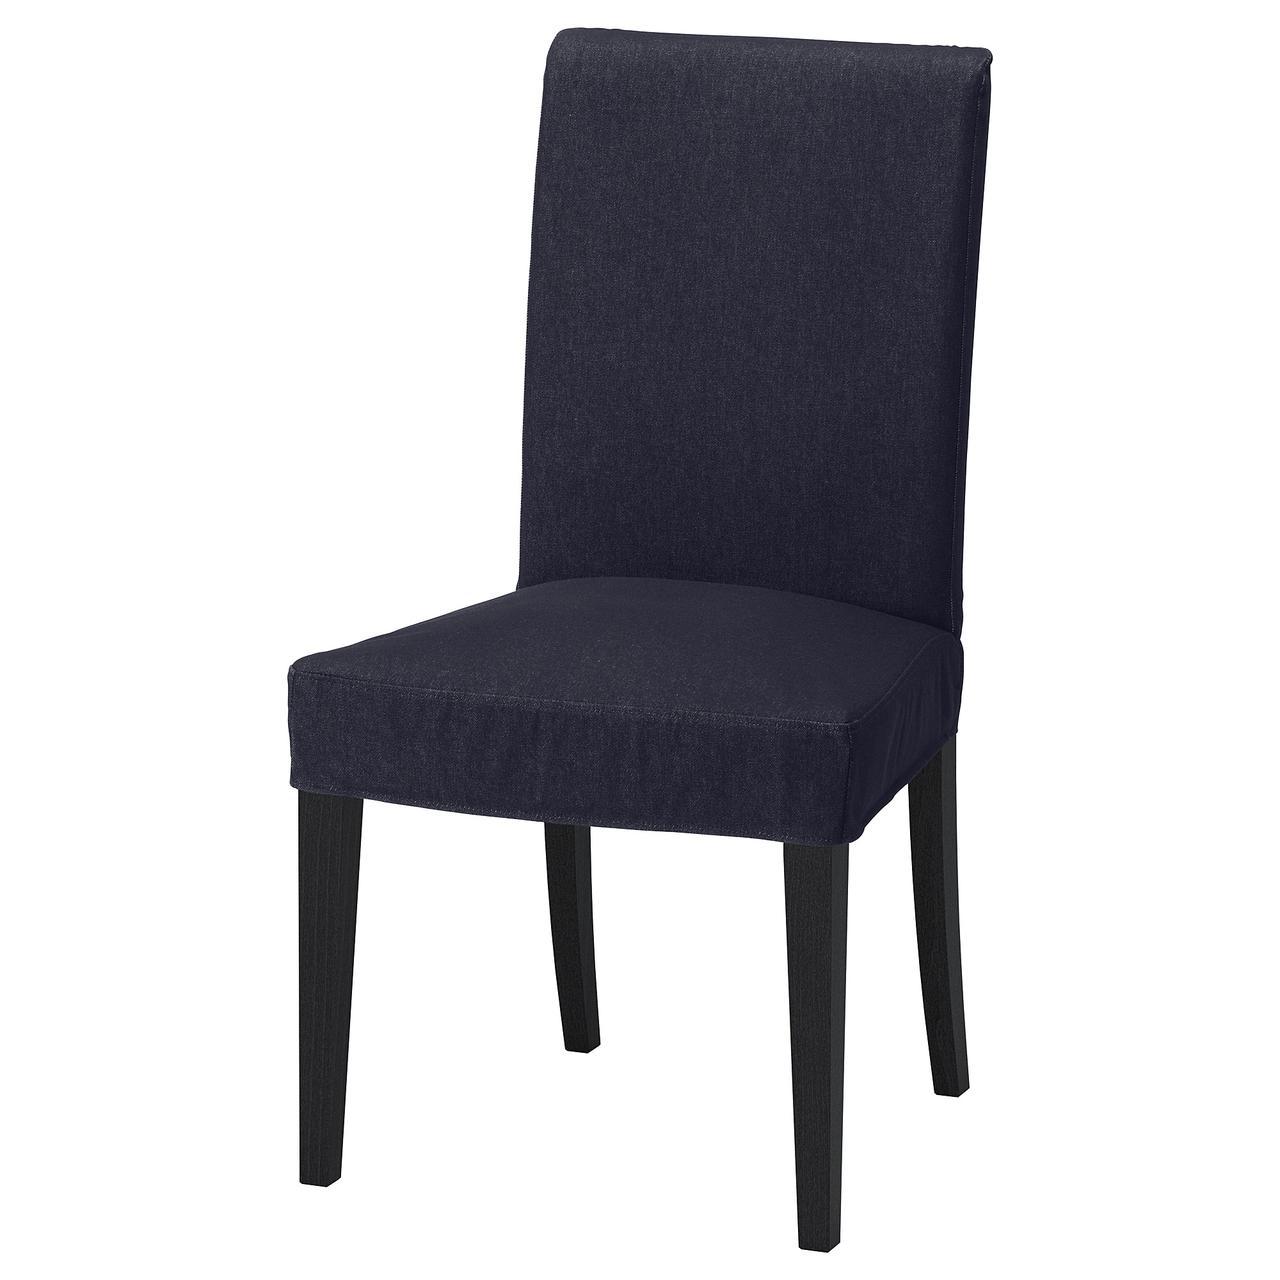 Кресло IKEA HENRIKSDAL Vansta темно-синее 192.519.46